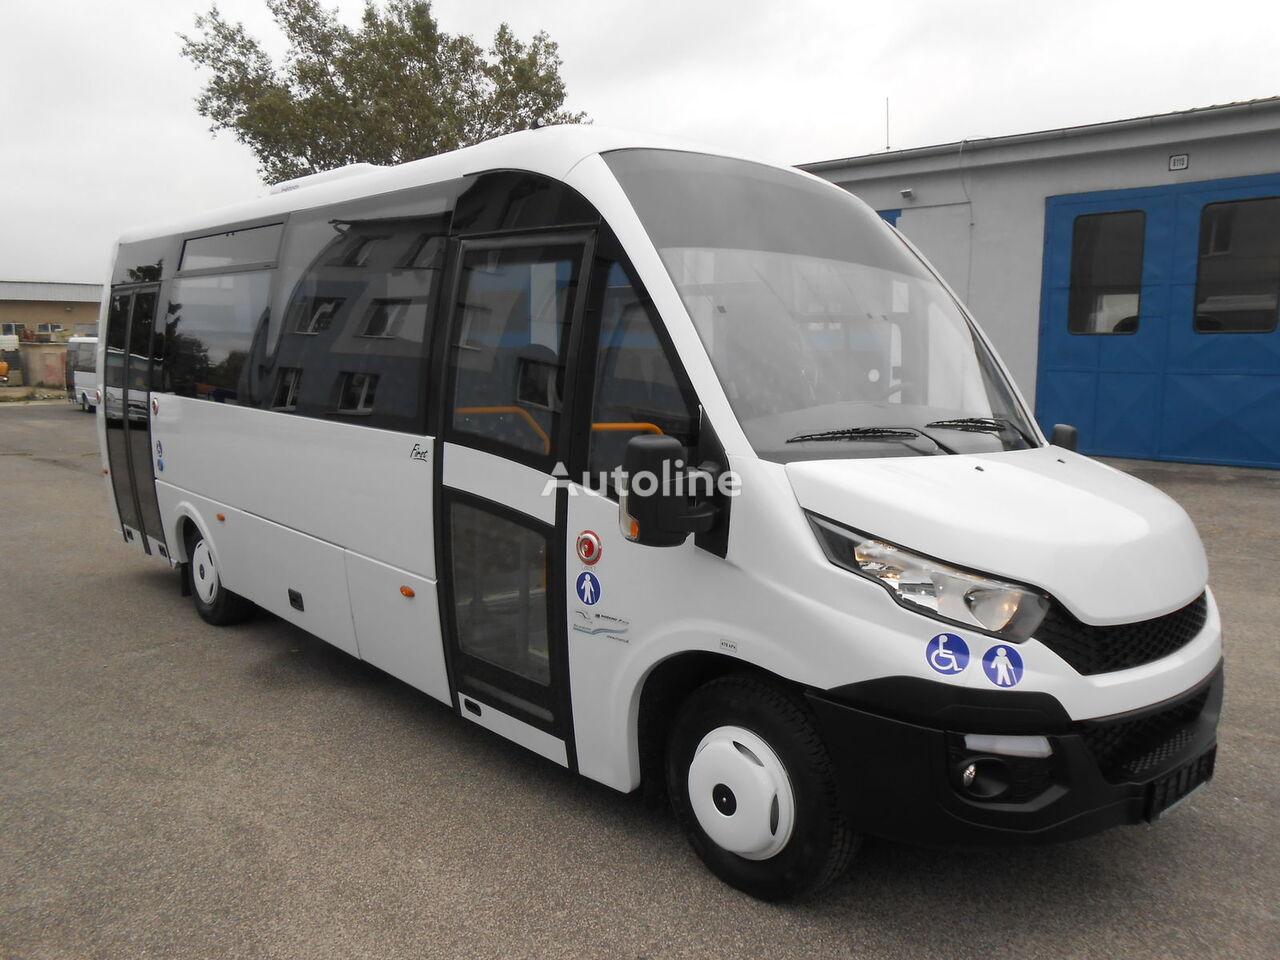 jauns IVECO  ROSERO FIRST FCLLI mikroautobuss pasažieru